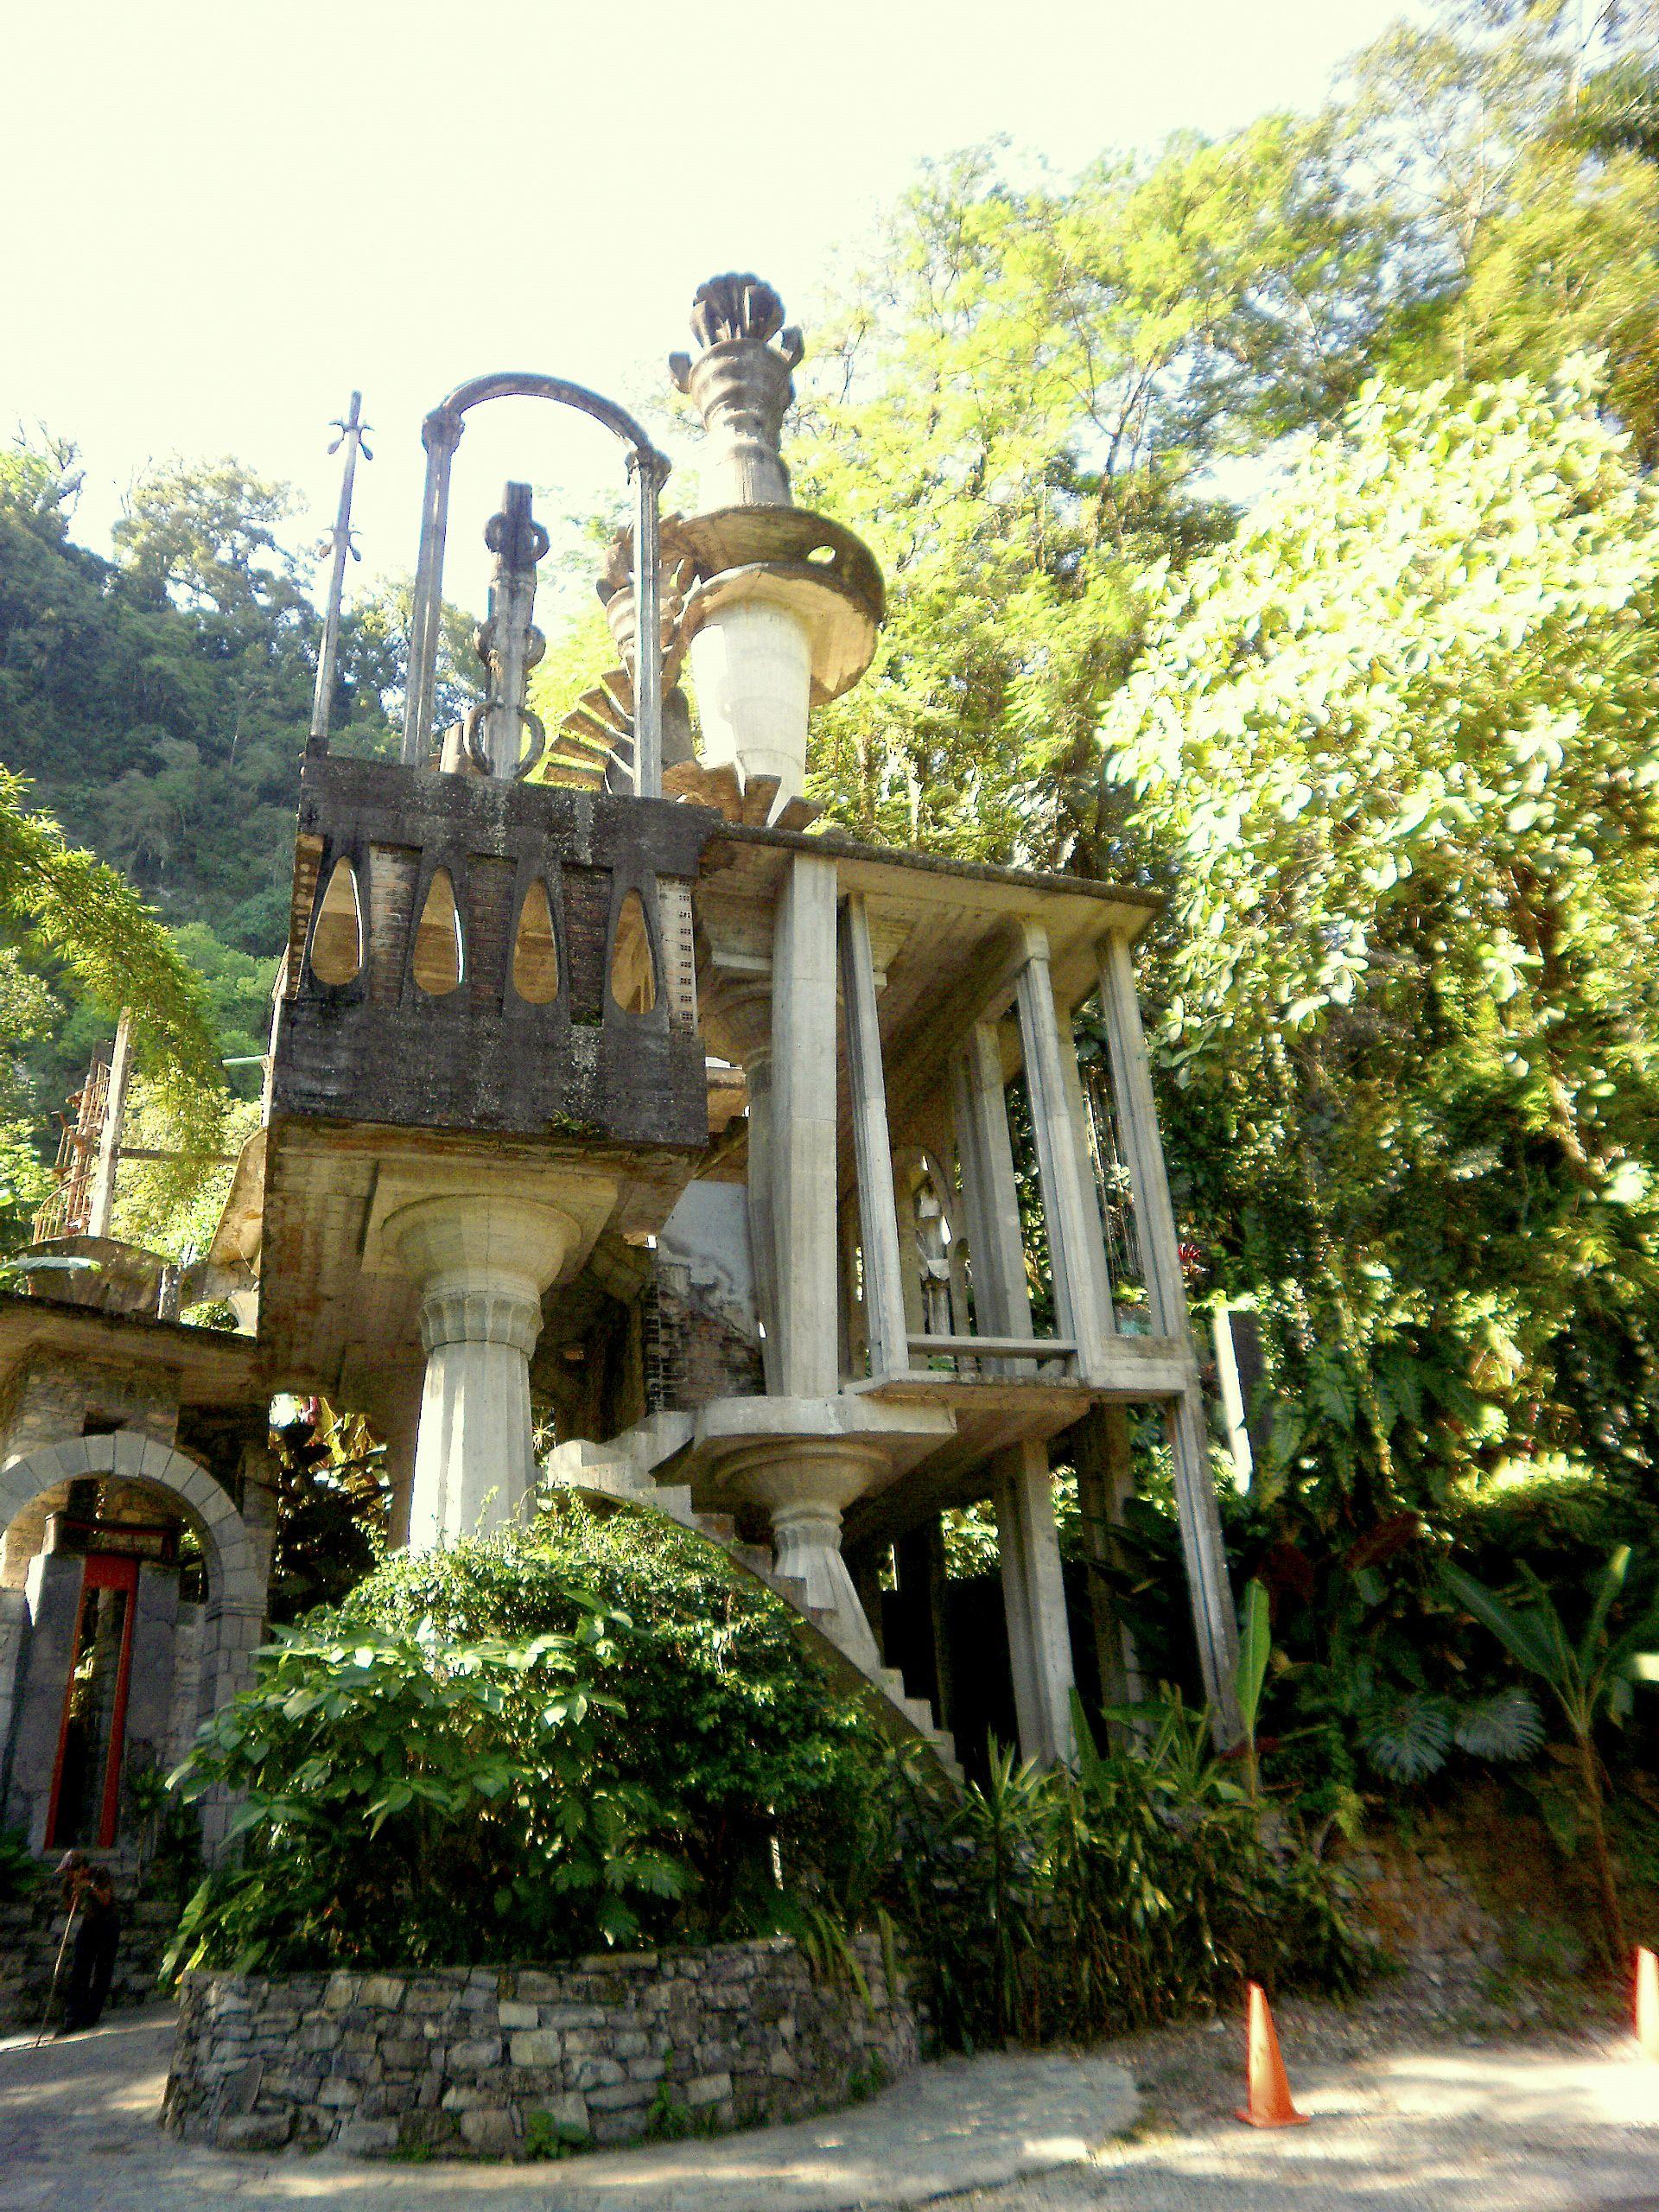 Castillo Surrealista of Edward James in Xilitla Mexico